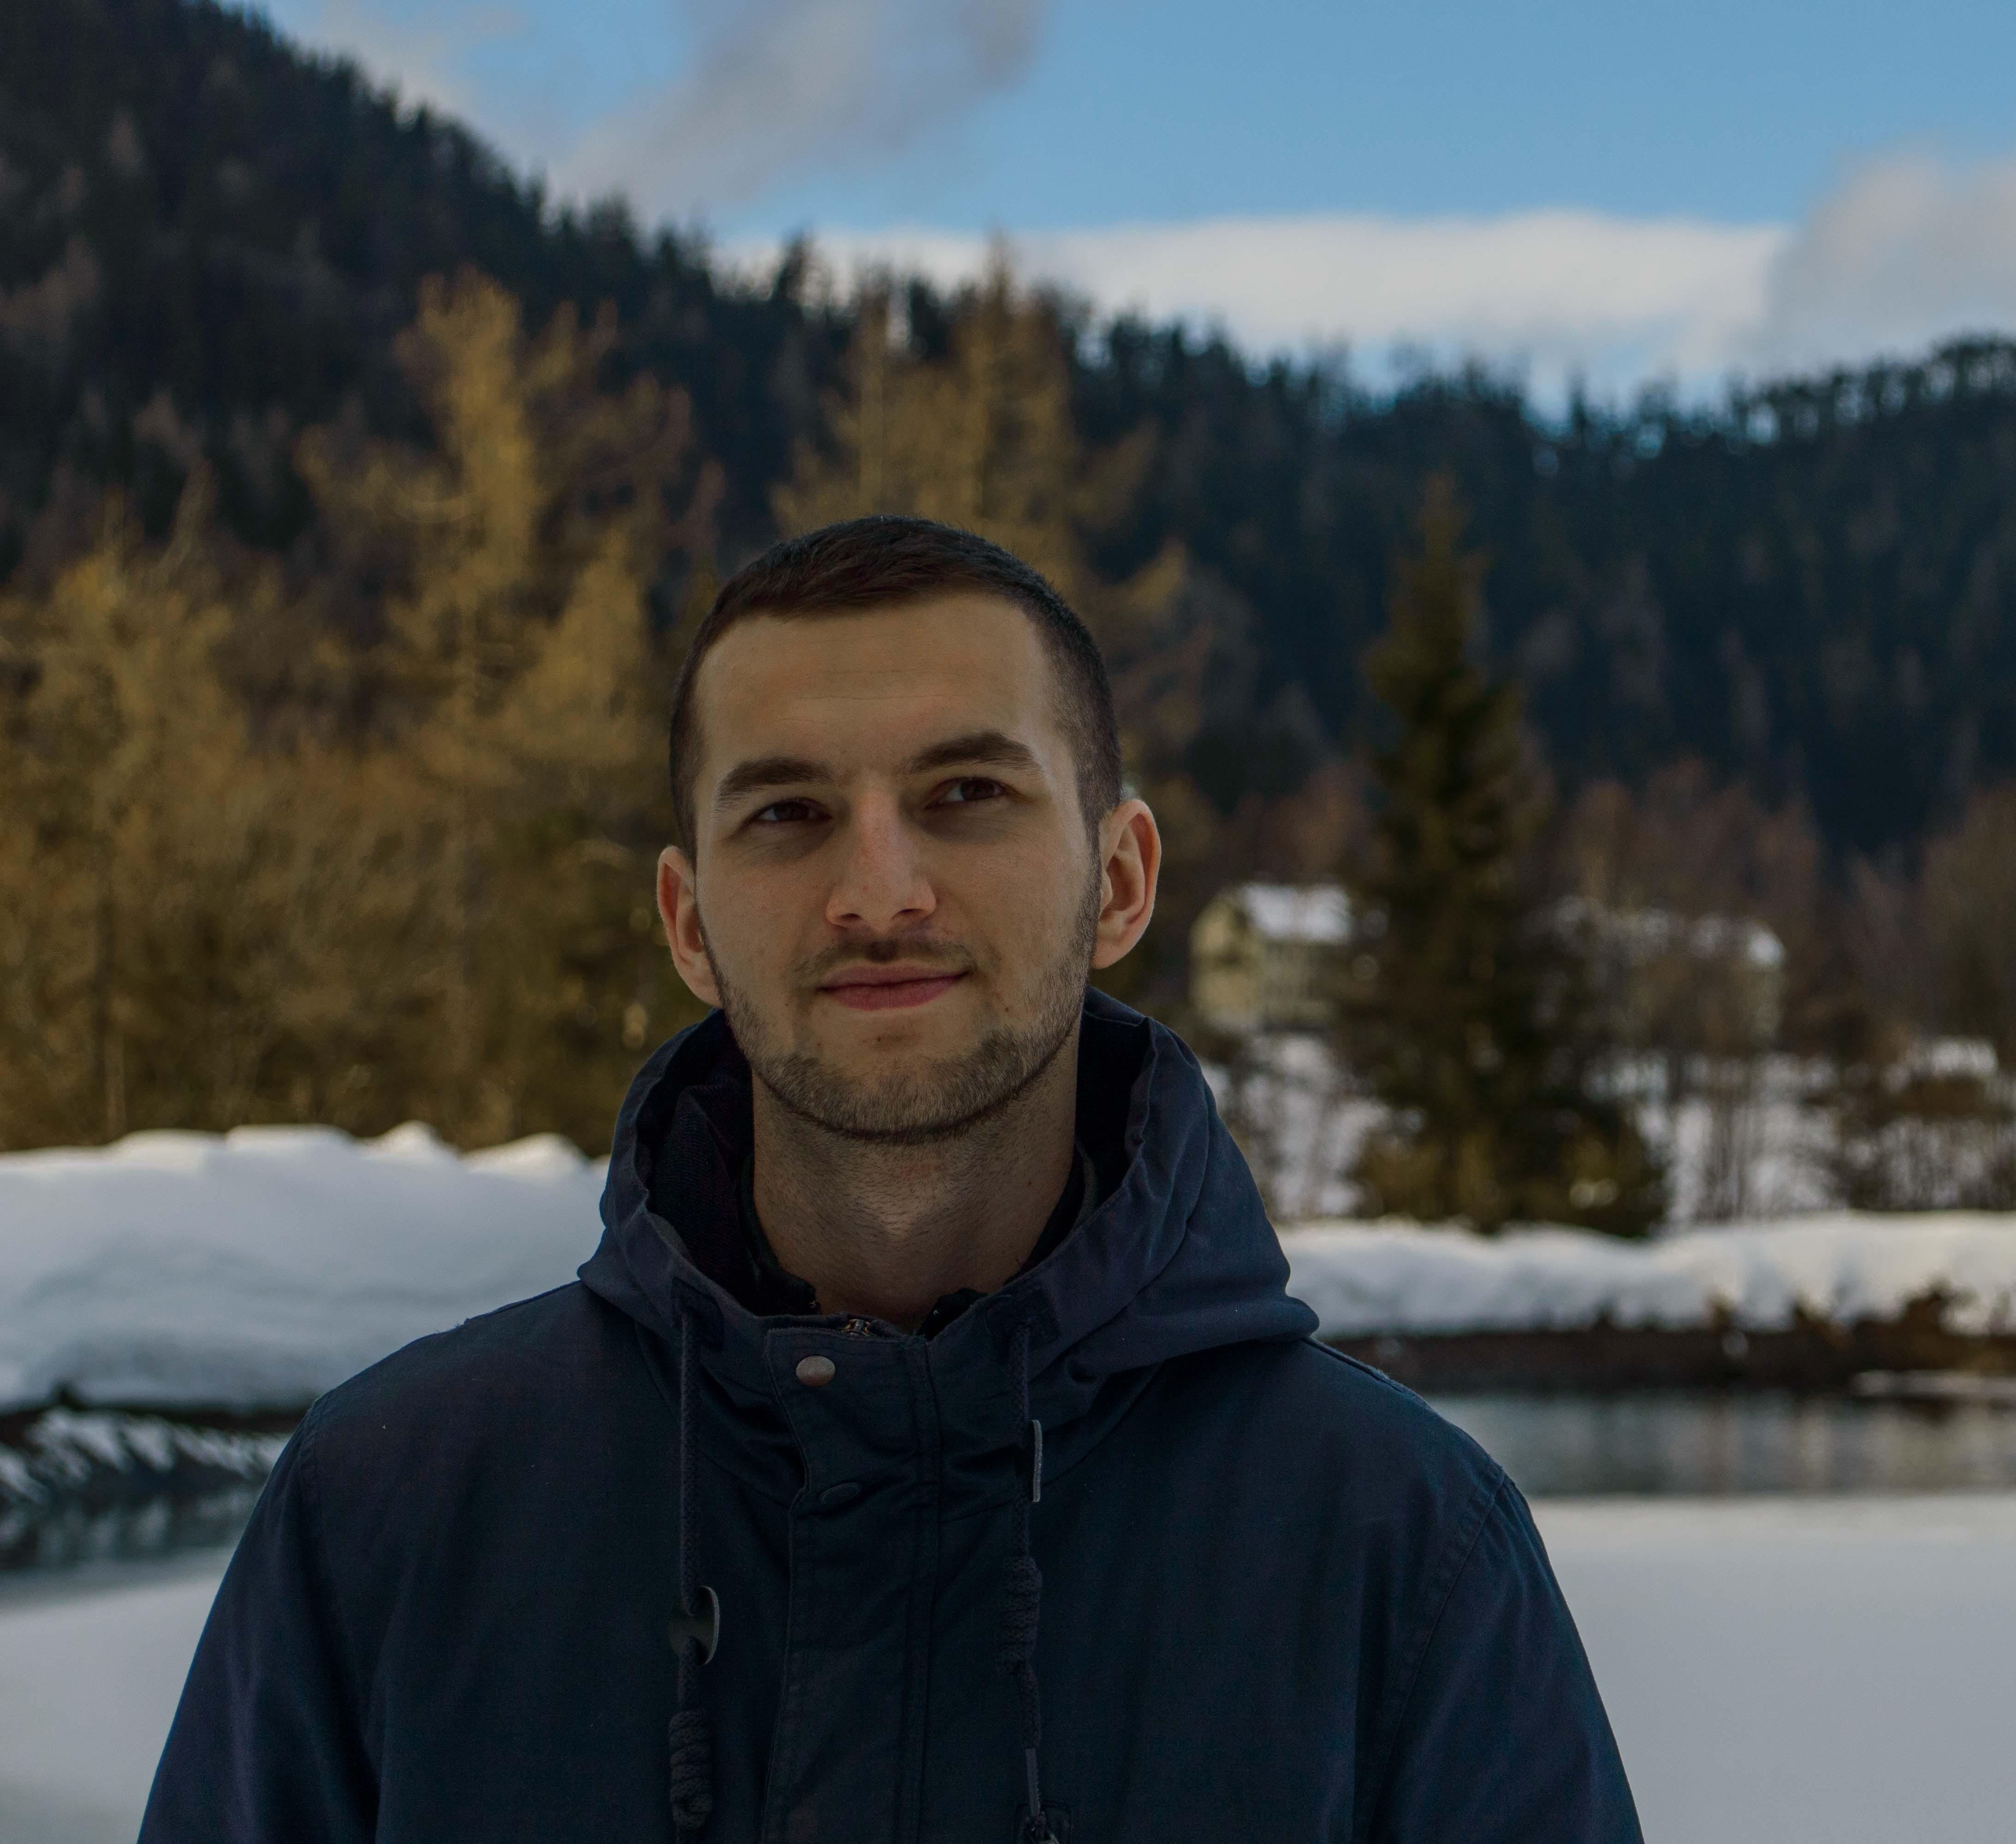 Go to Sebastian Schuppik's profile